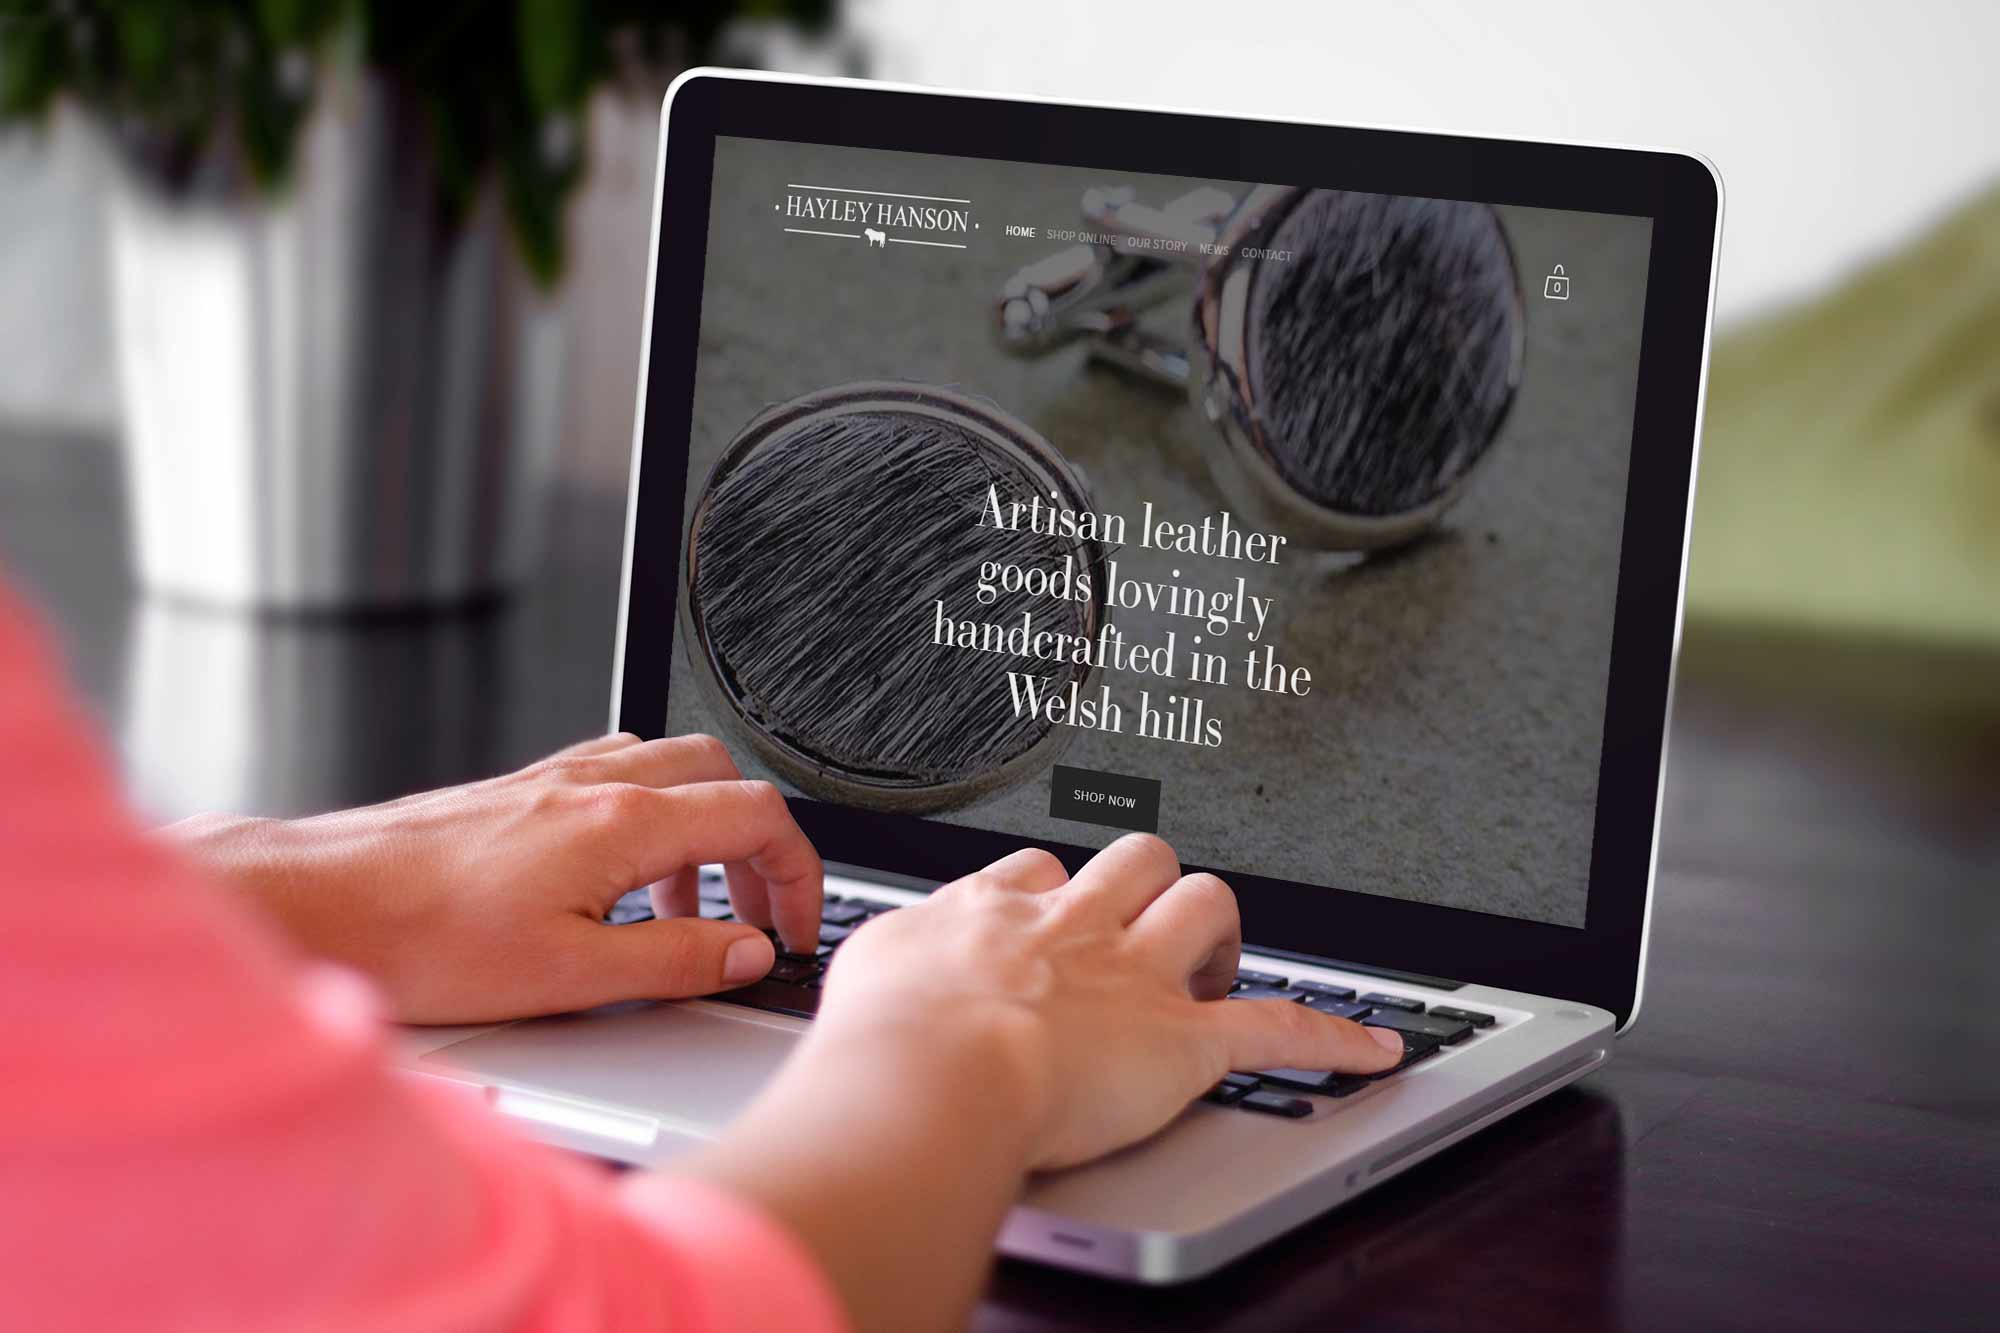 Hayley-hanson-website-on-laptop.jpg